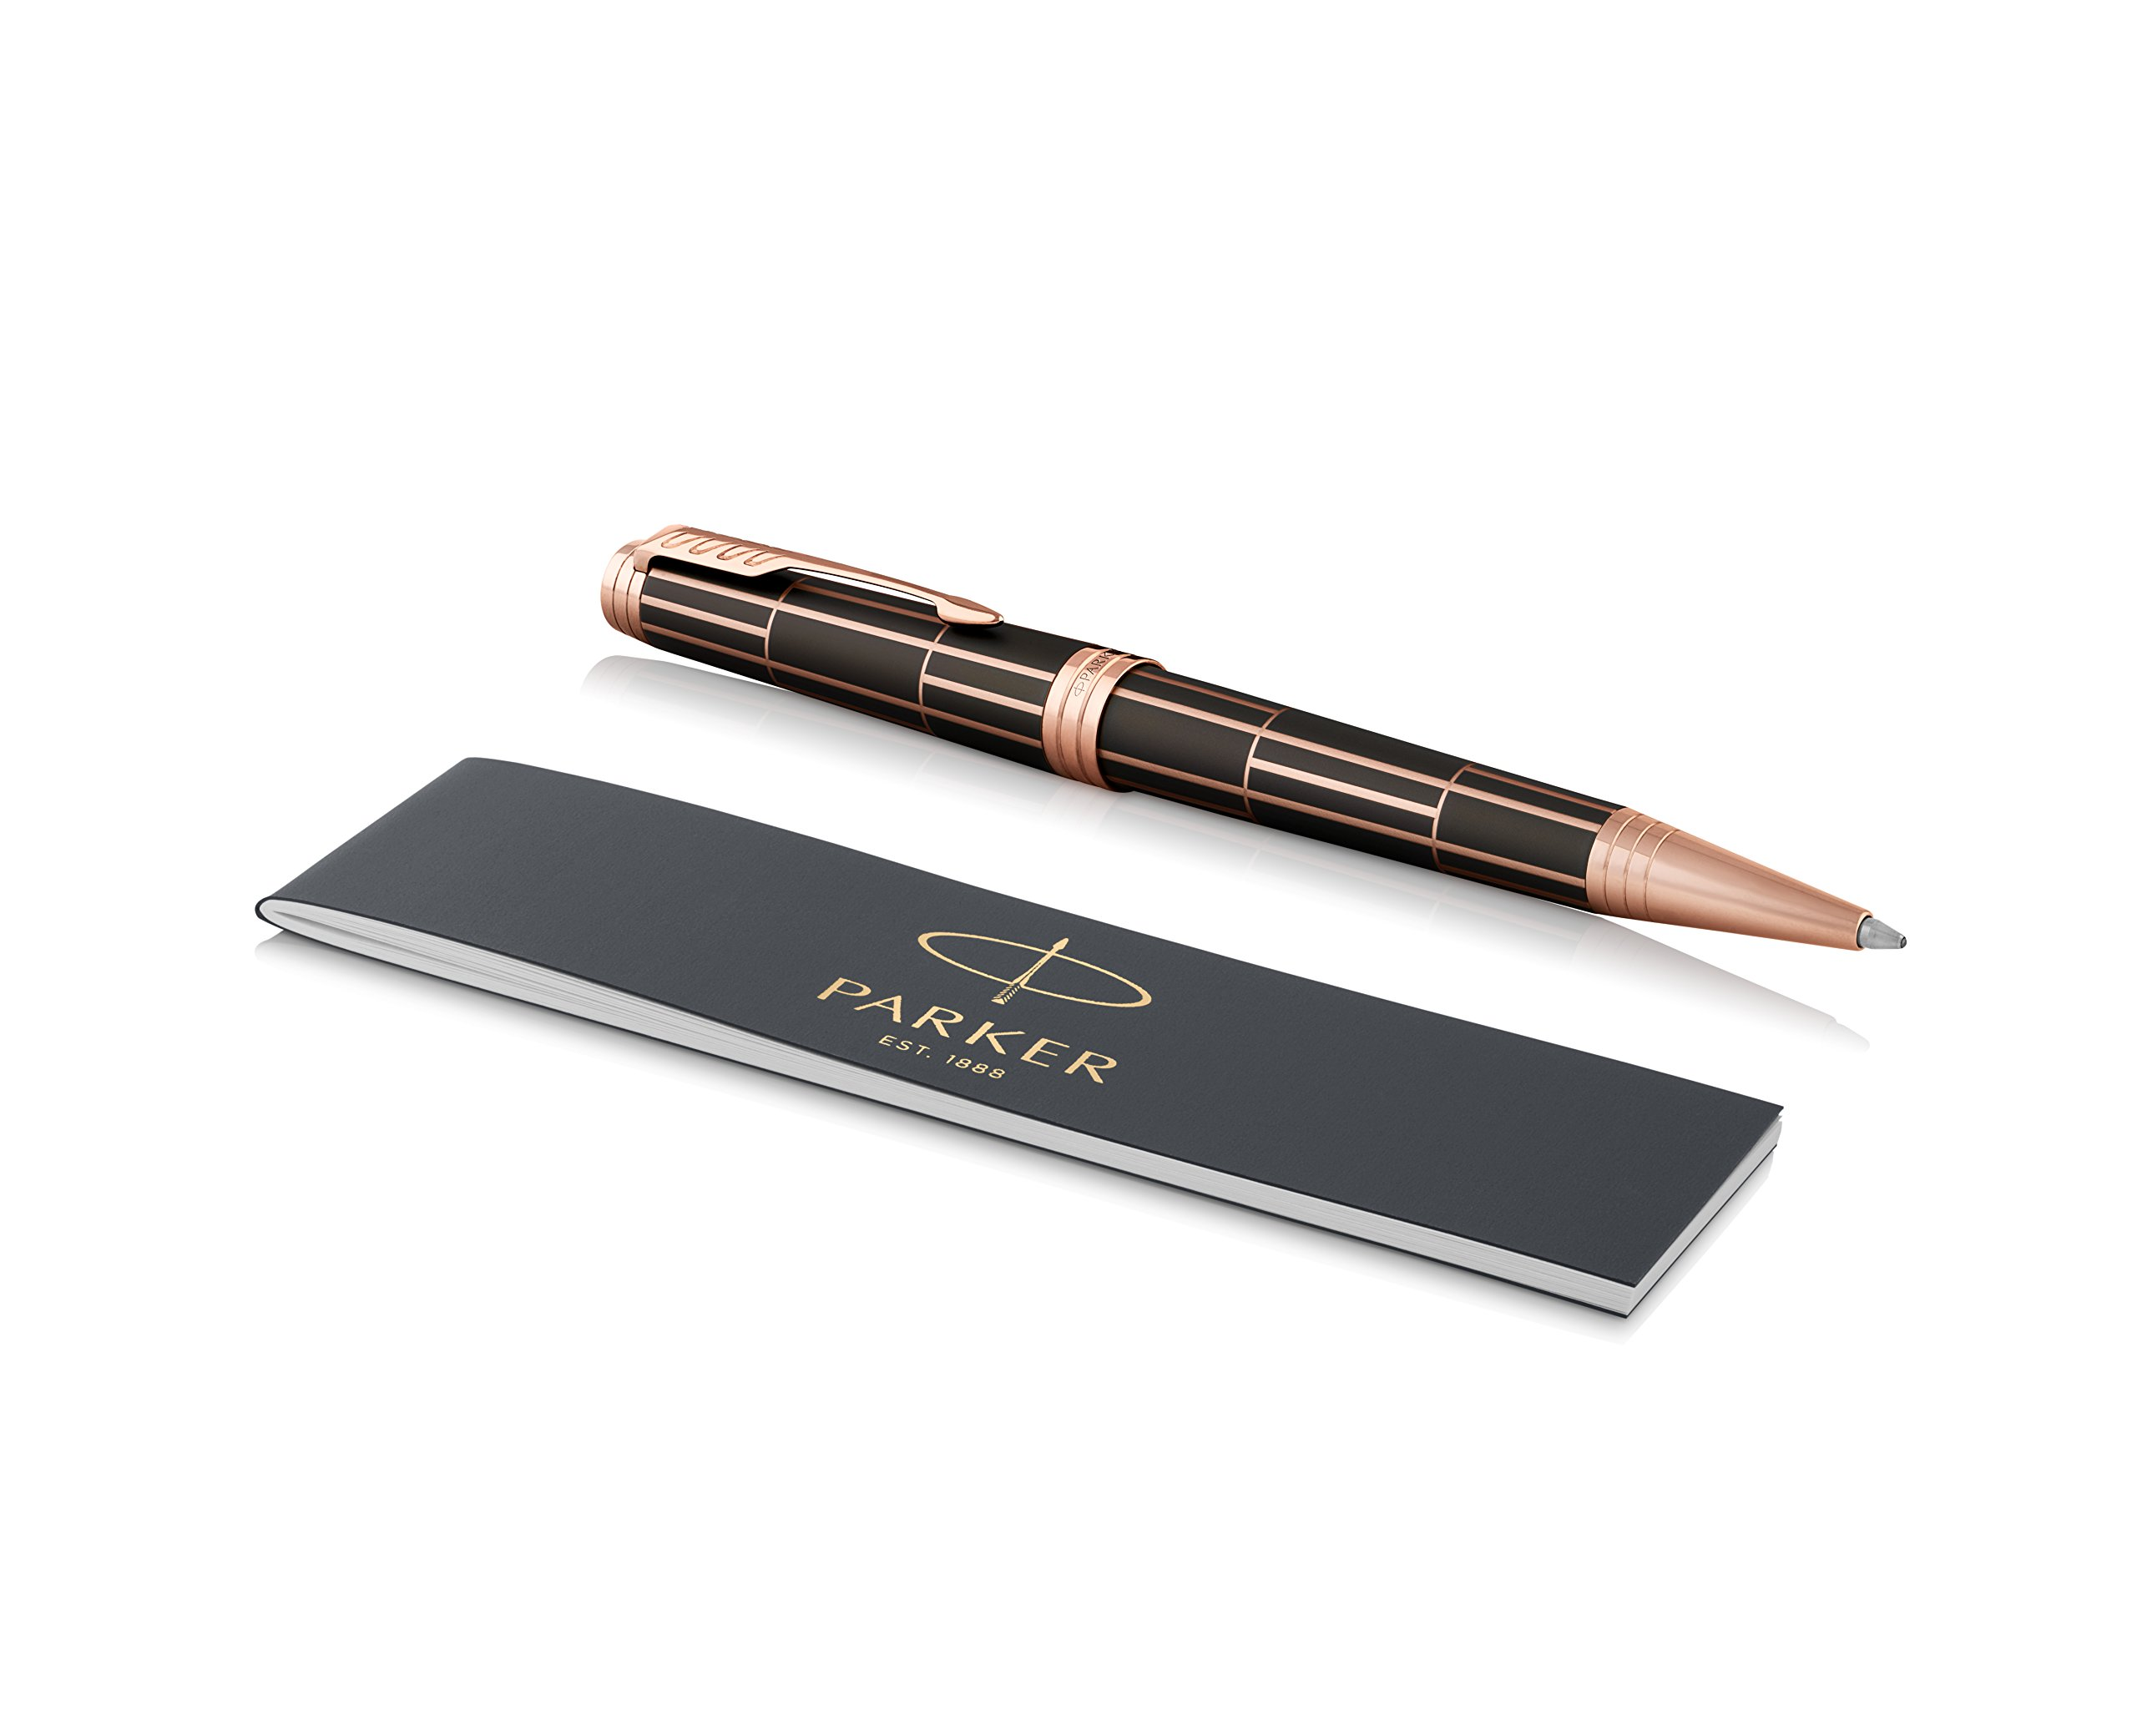 PARKER Premier Ballpoint Pen, Luxury Brown with Pink Gold Trim, Medium Point Black Ink Refill